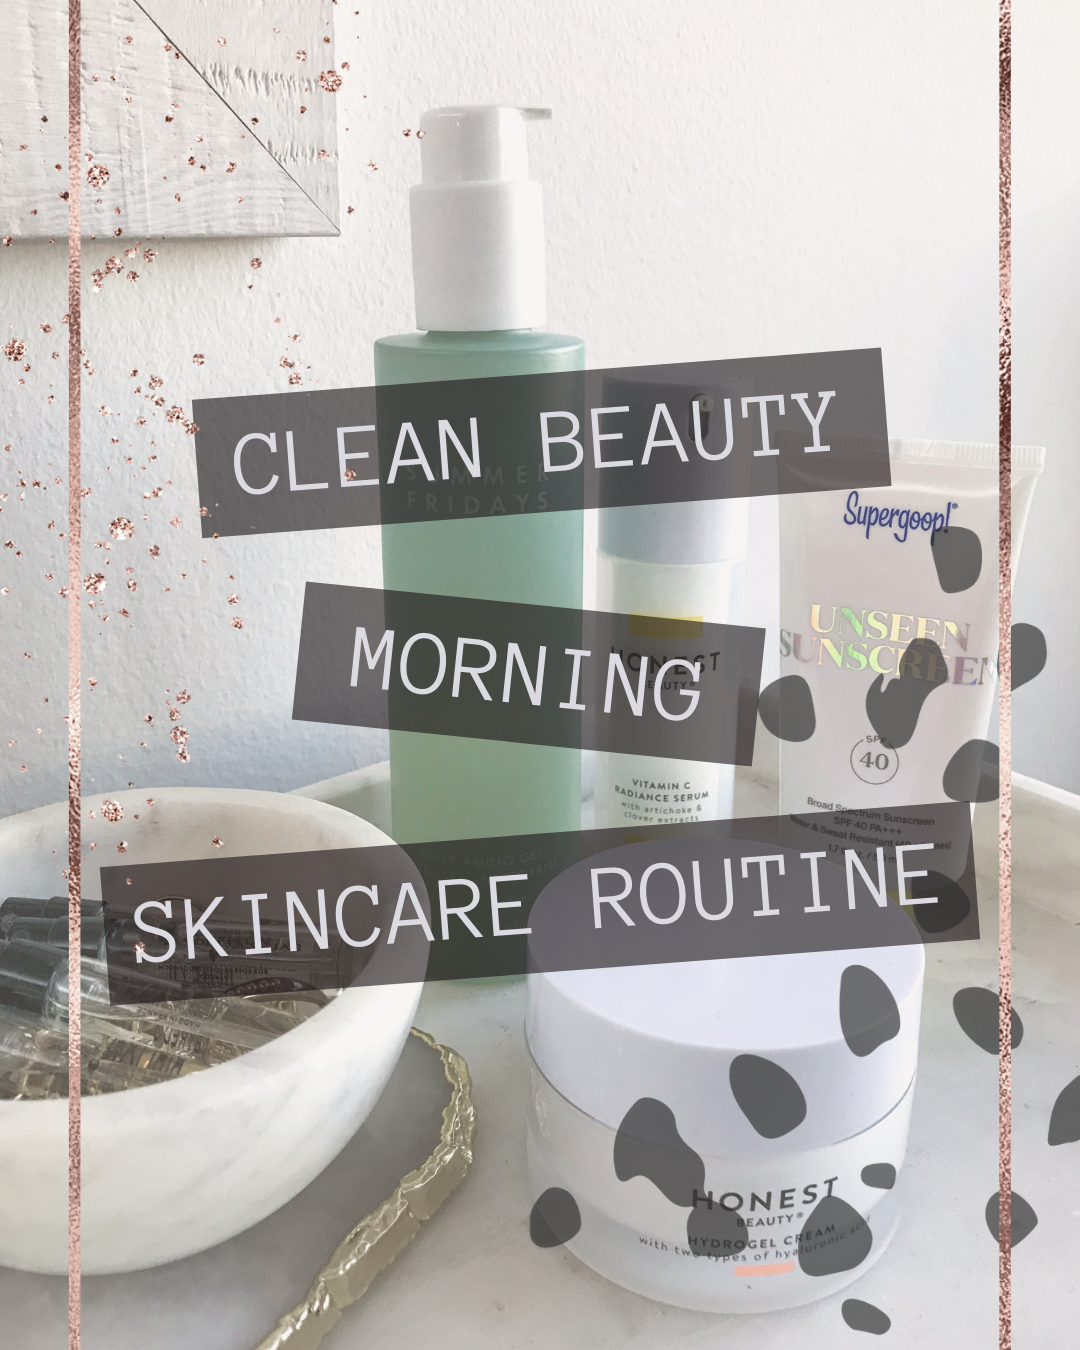 morning skincare